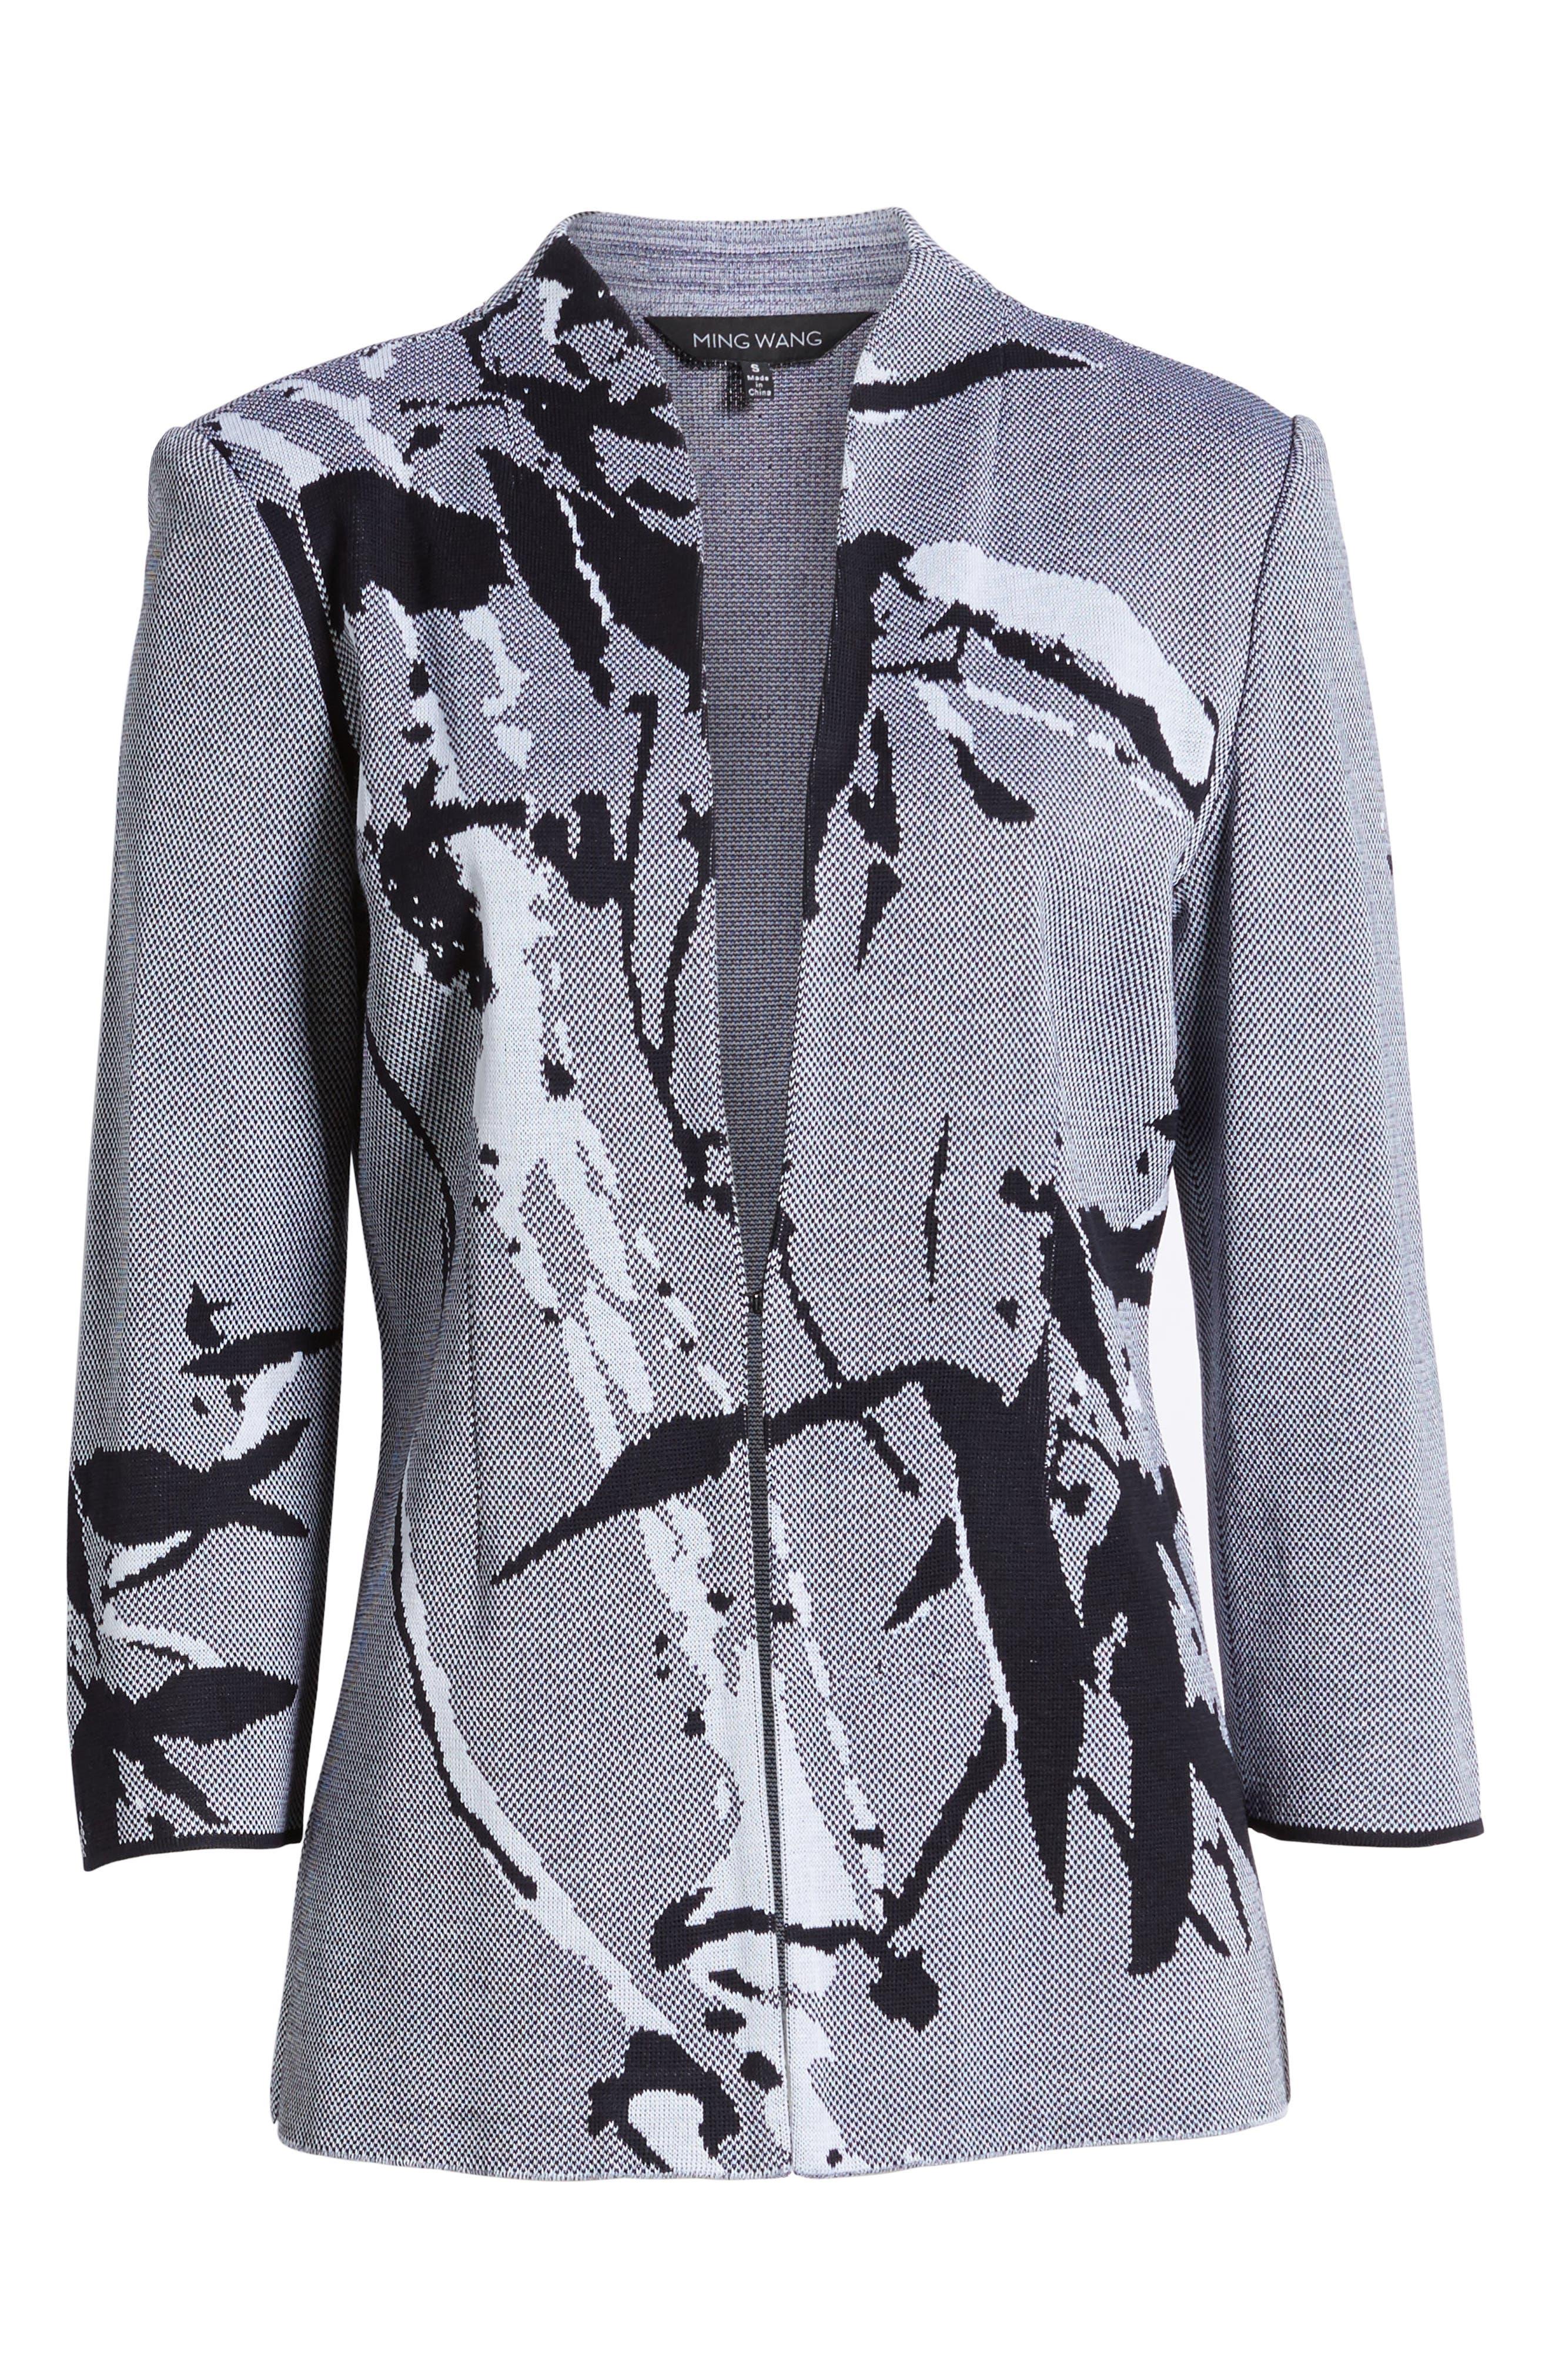 Abstract Jacquard Jacket,                             Alternate thumbnail 6, color,                             Navy/ White